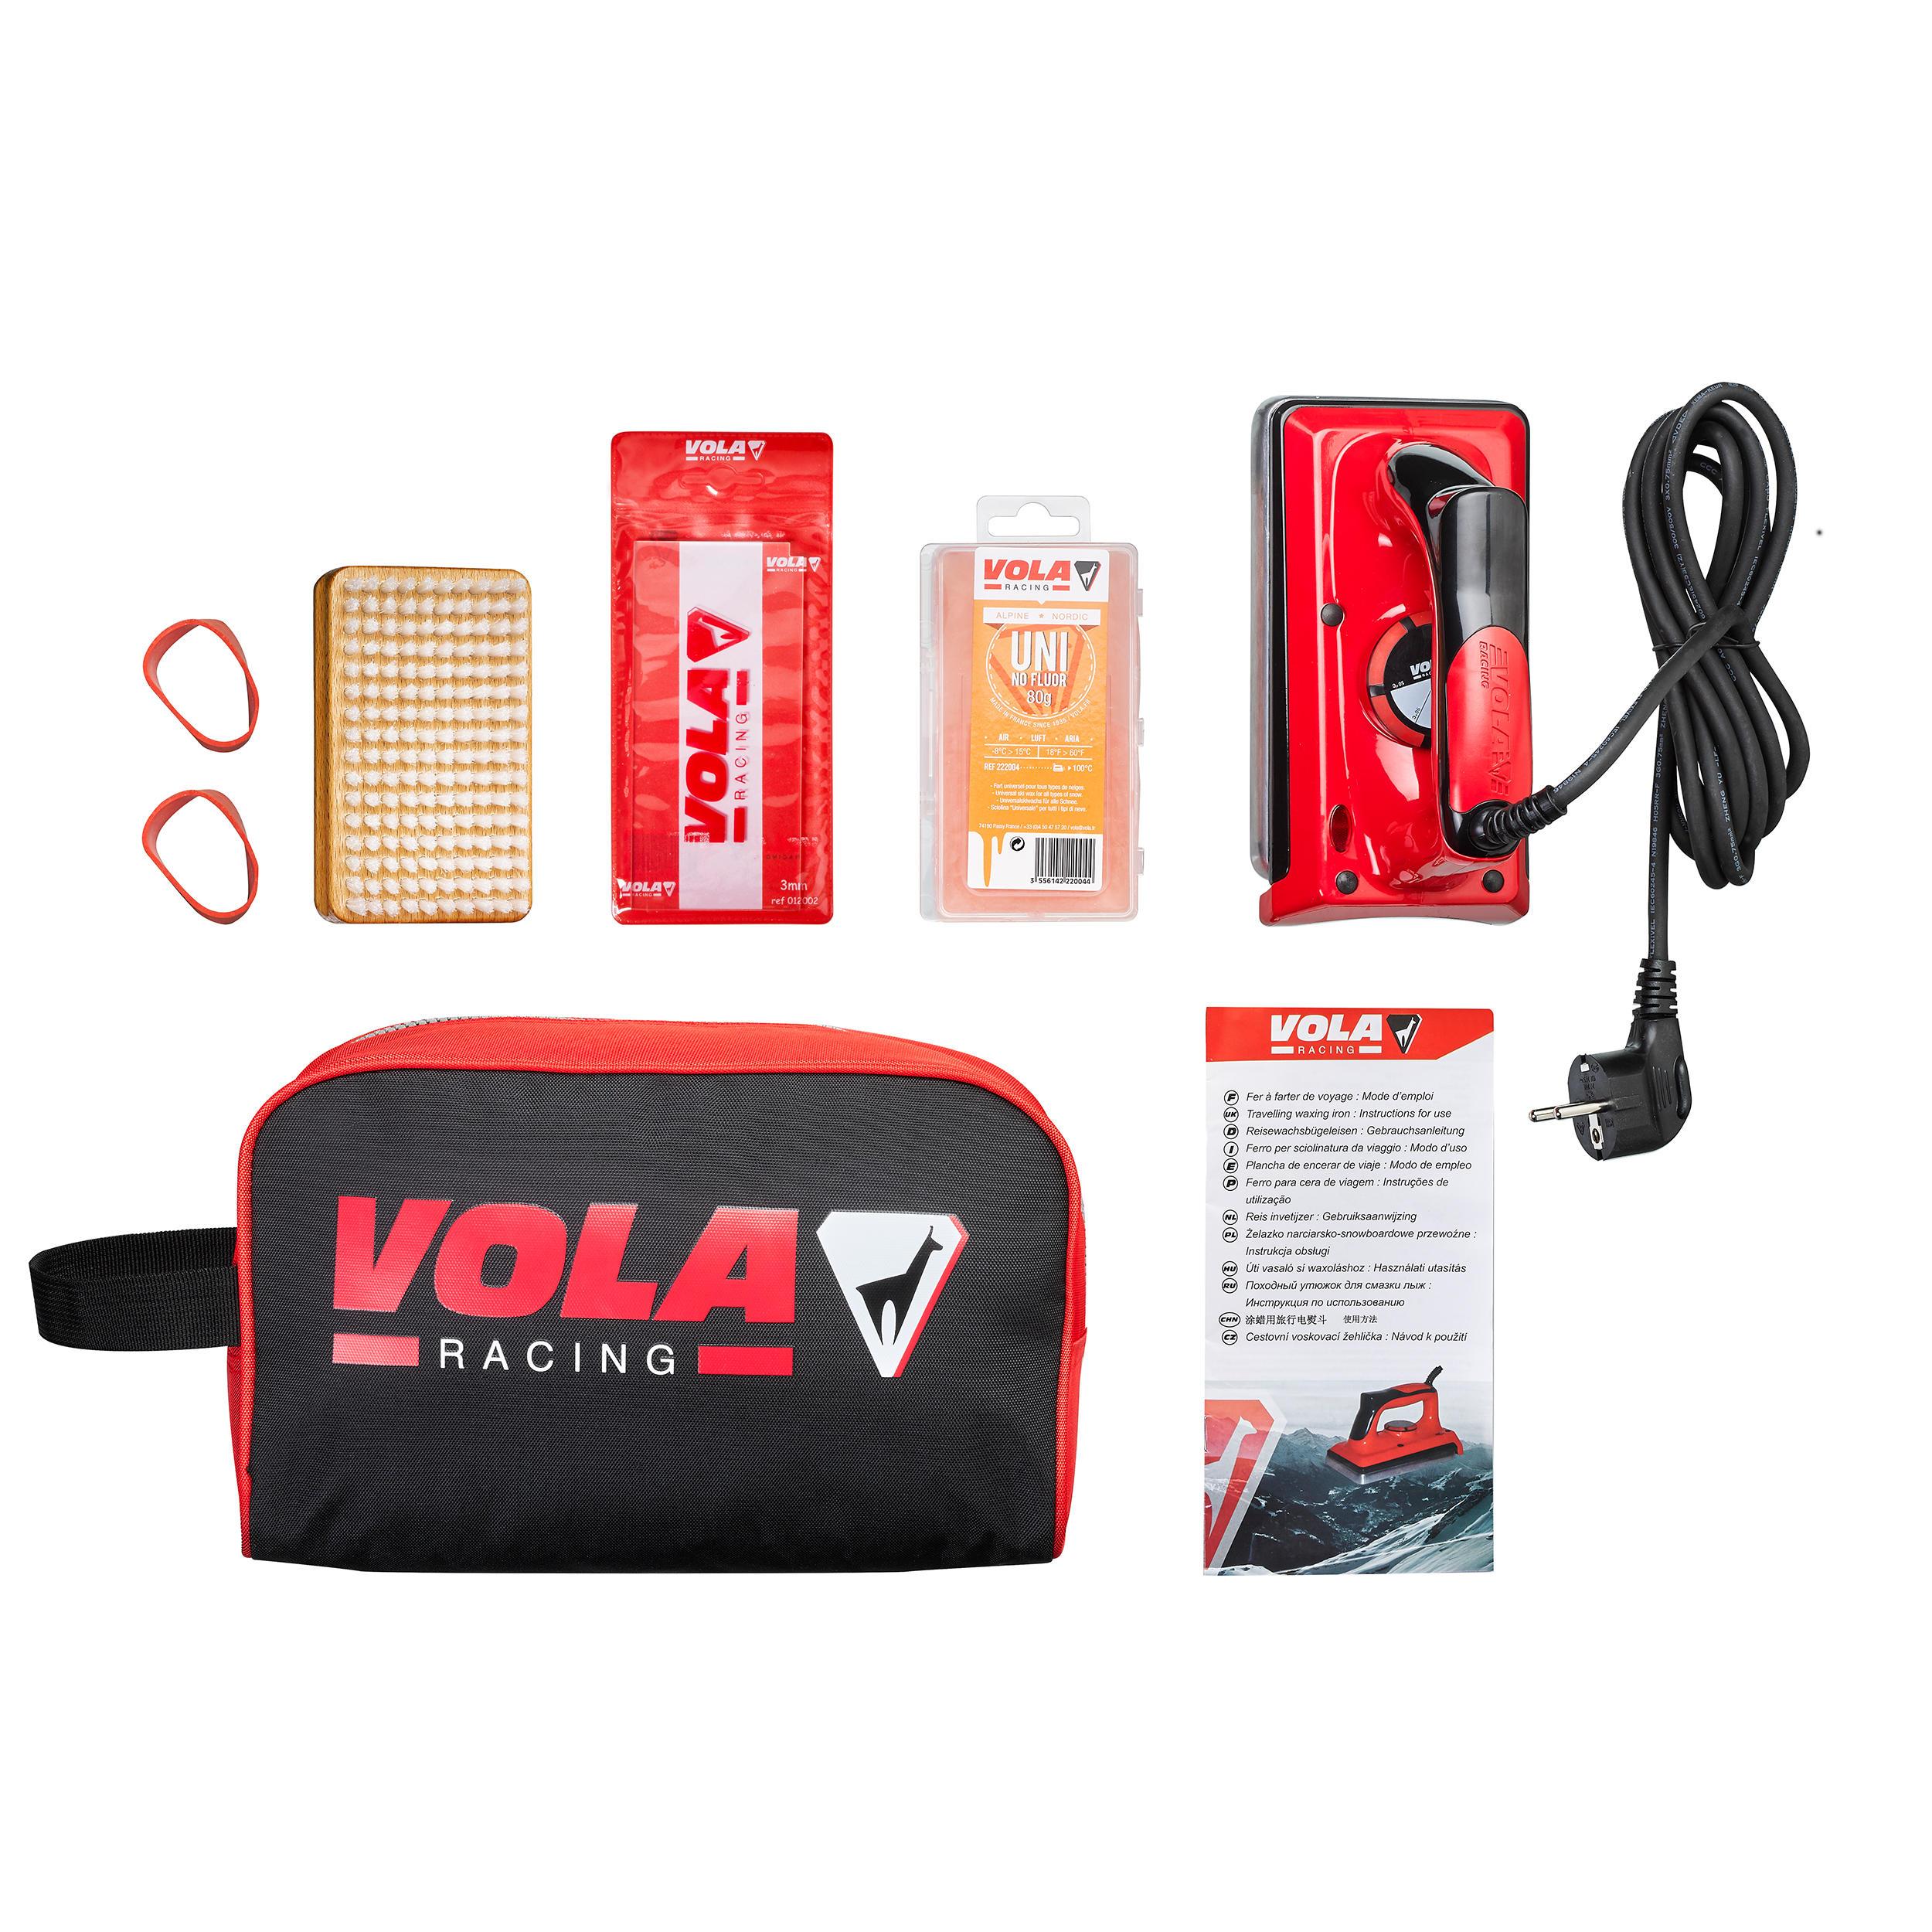 Vola Ski Wax Preparation Kit Vola Decathlon